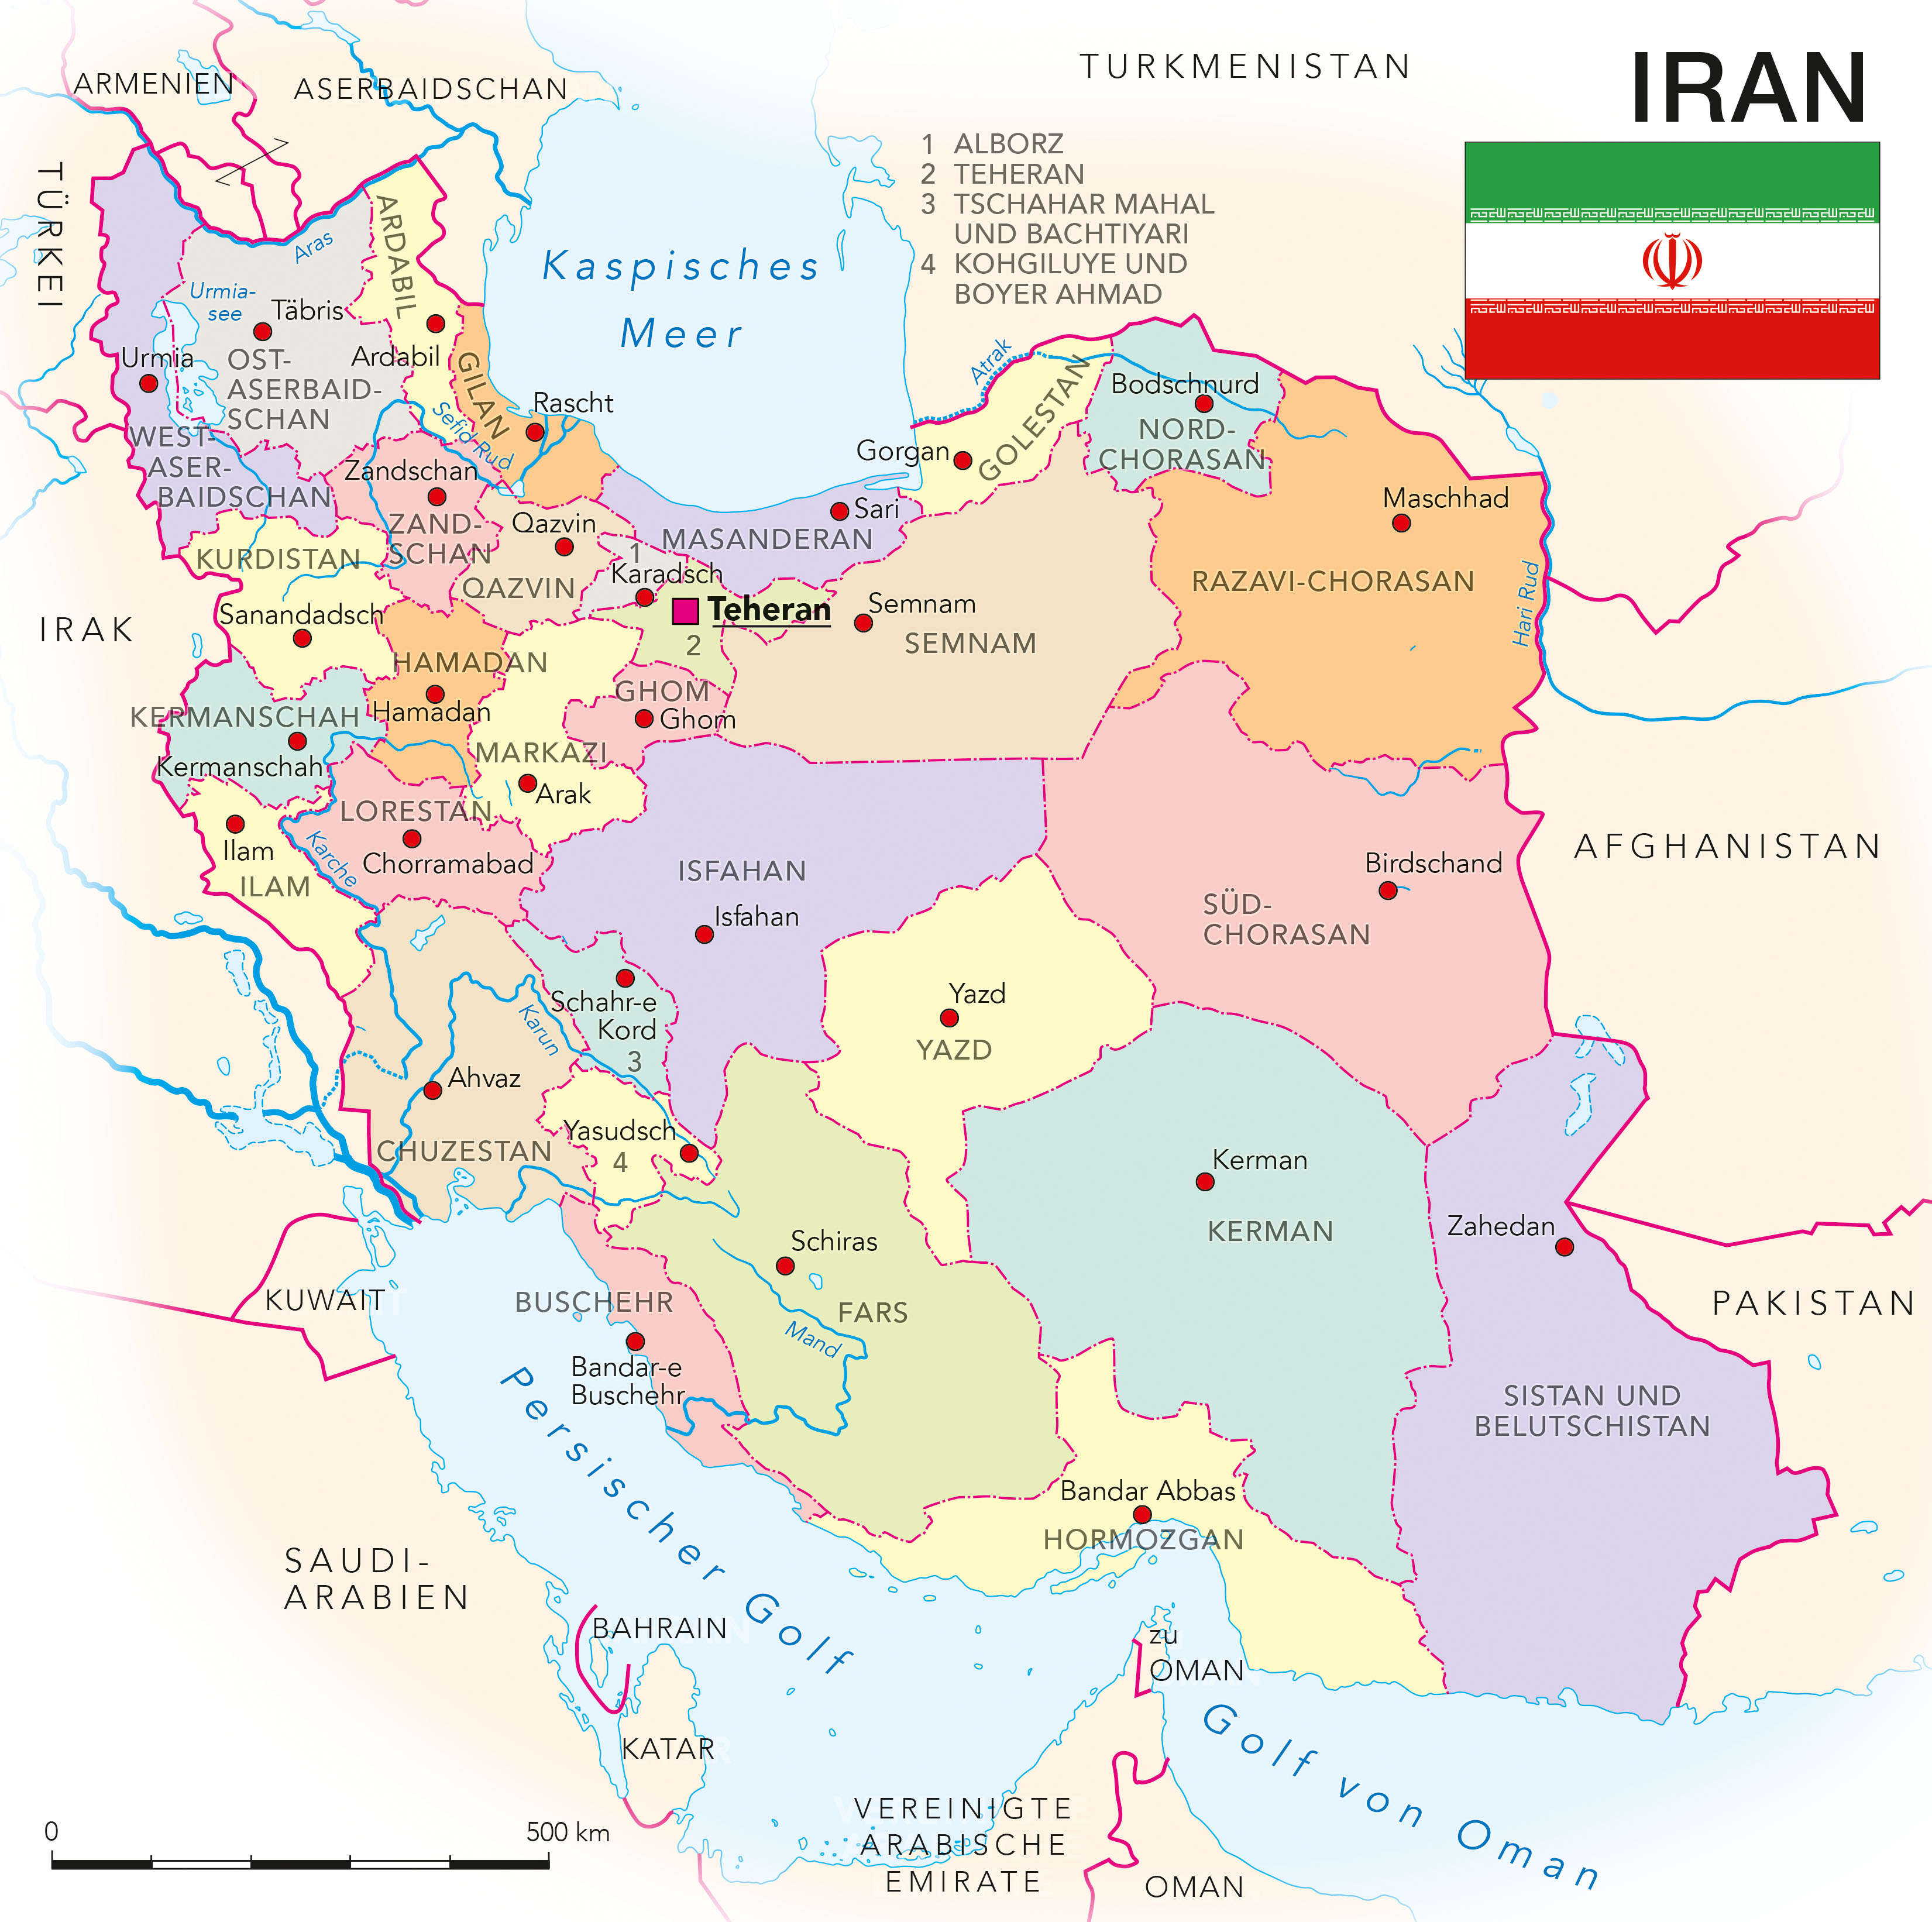 Iran Kooperation International Forschung Wissen Innovation